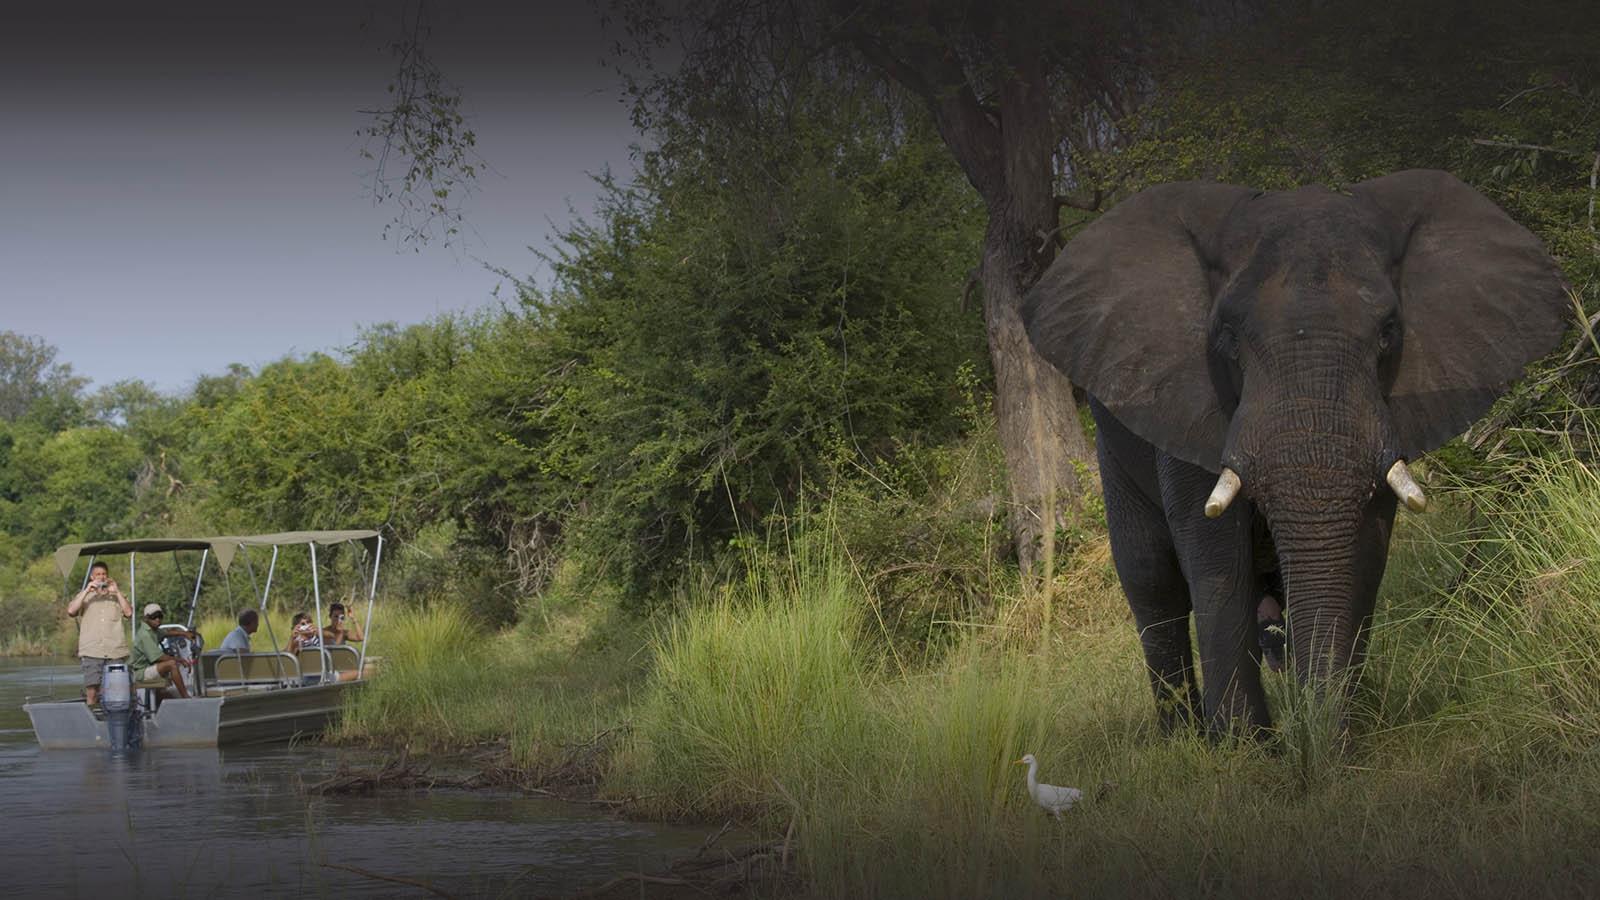 baines river camp zambia-in-style-safari-packages-lodges-lower-zambezi-remote-african-safari-experience-boat-safari-elephants